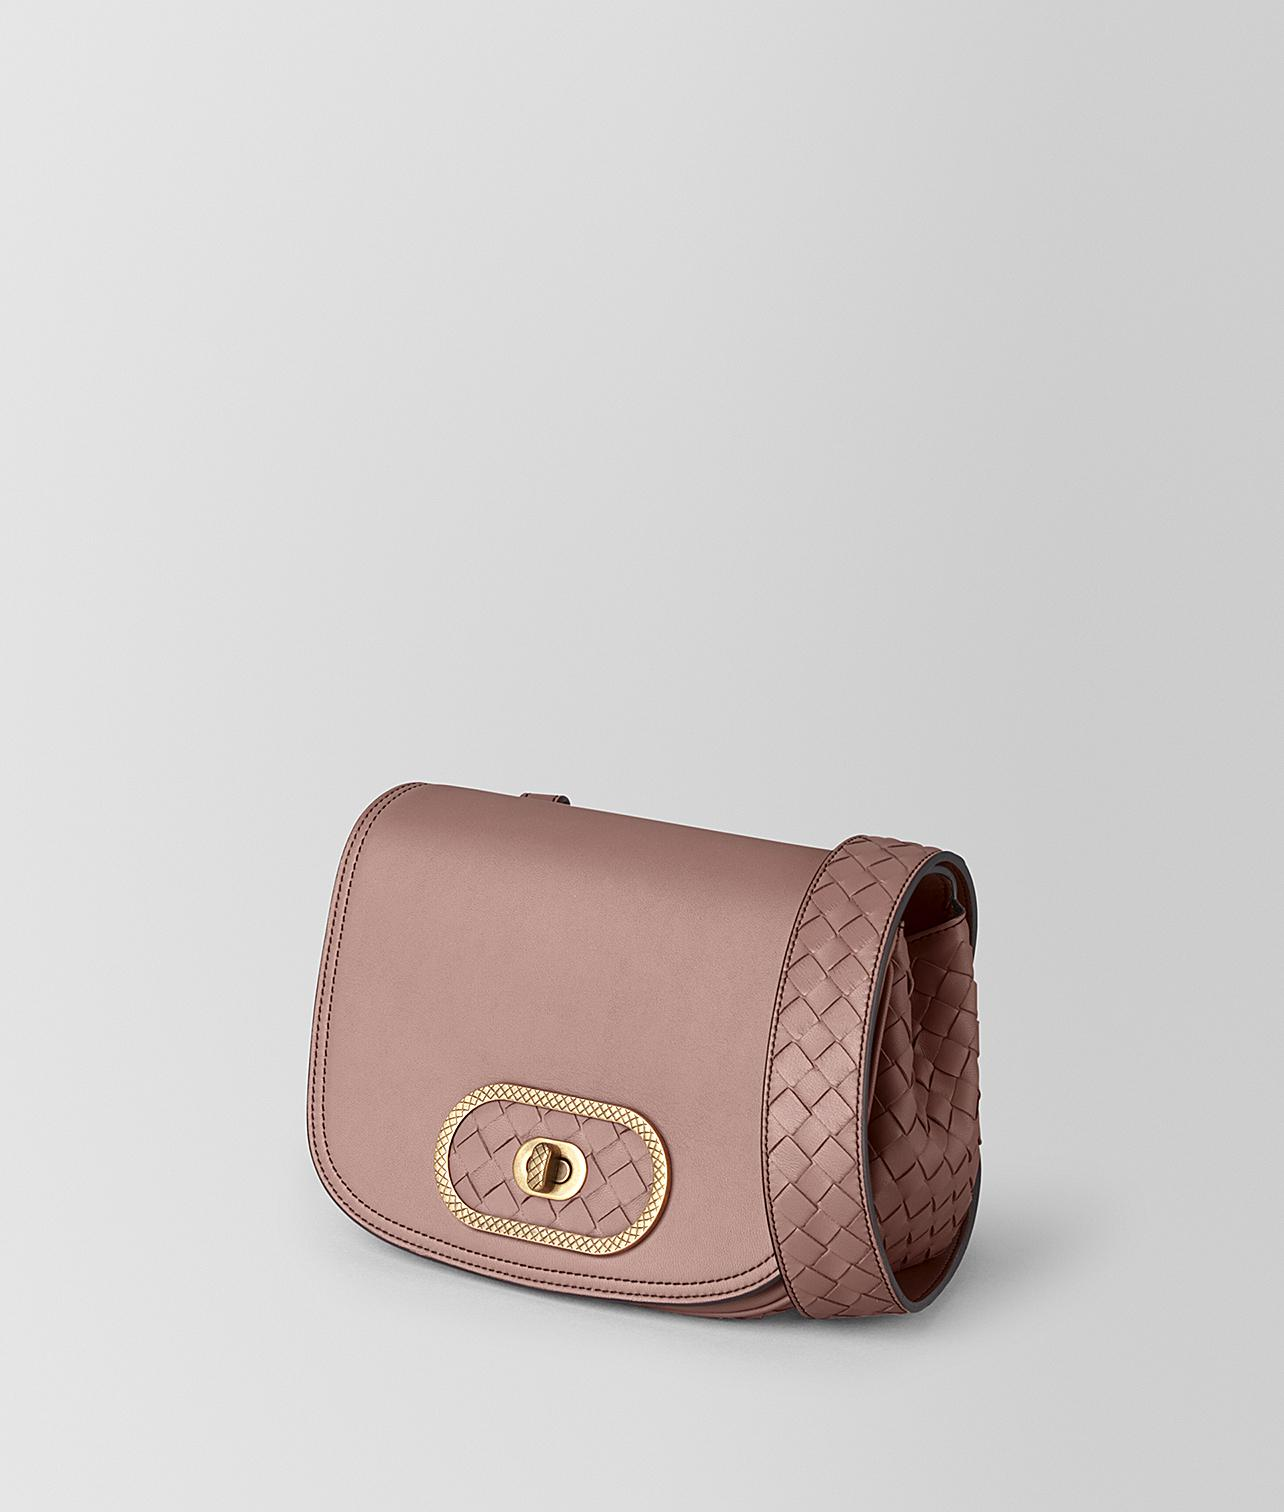 e1f9a9abebe1 Lyst - Bottega Veneta Bv Luna Bag In Nappa in Pink